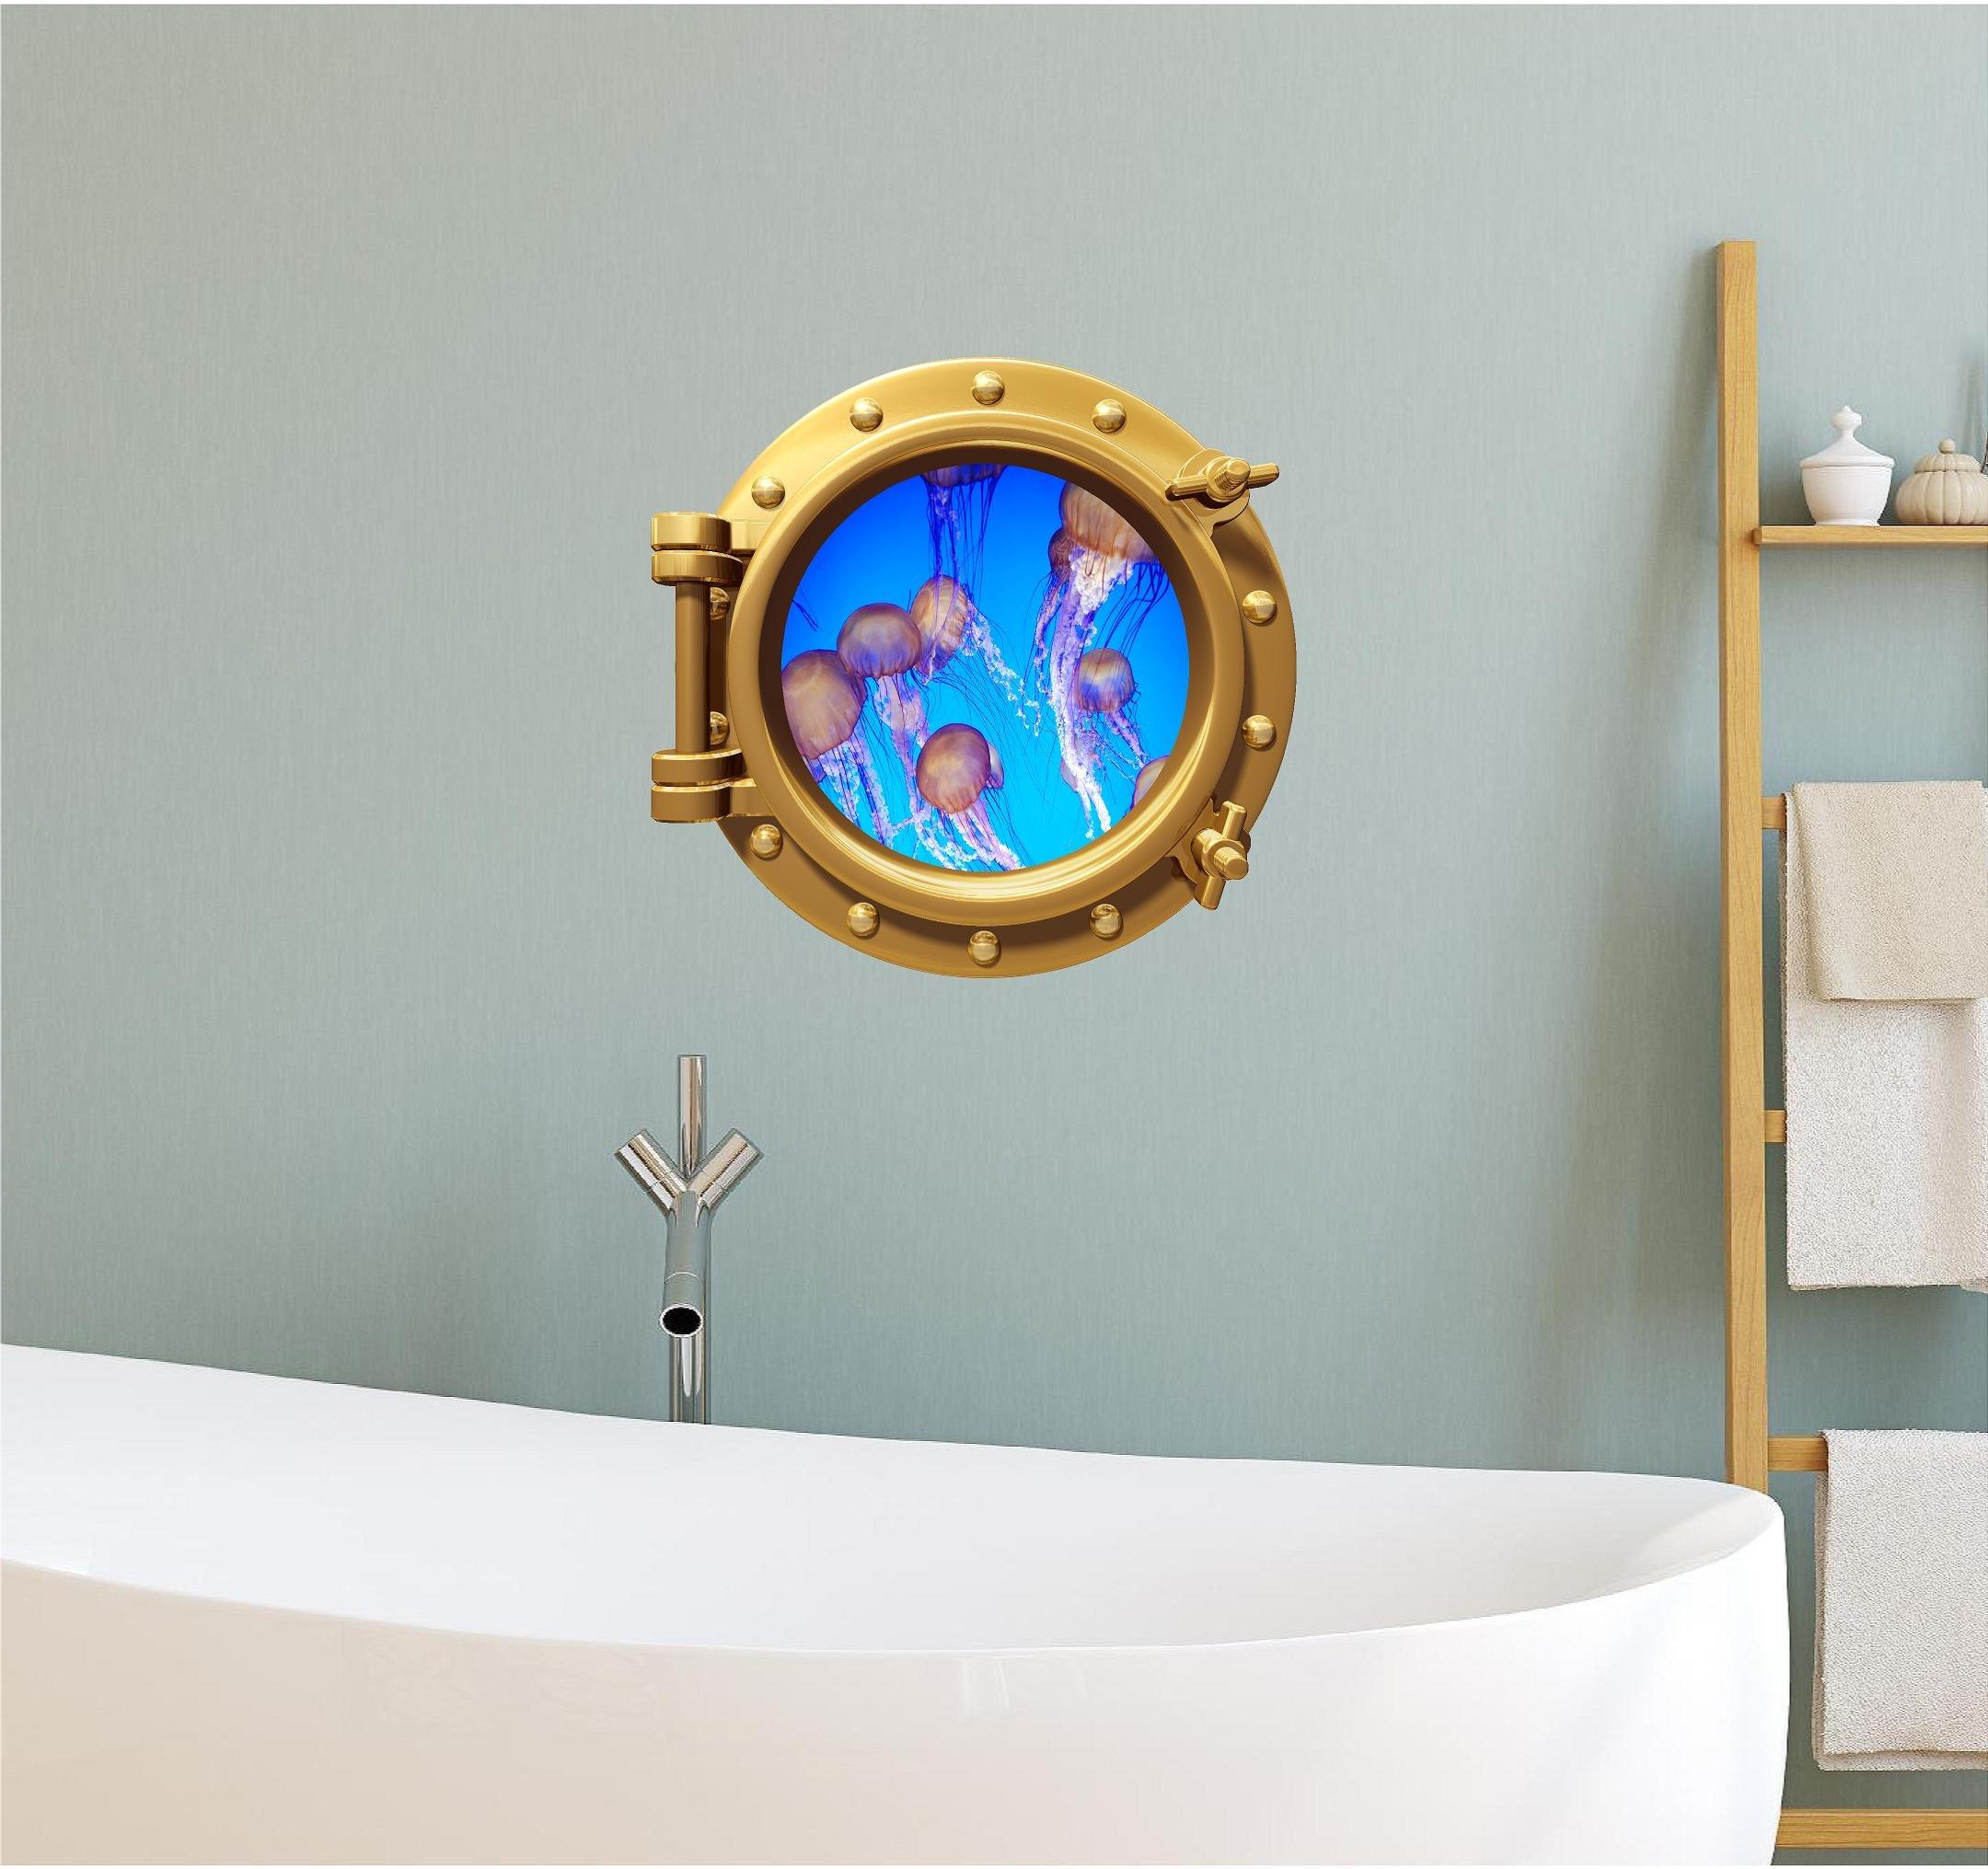 12'' Port Scape WALL DECAL Sea JELLYFISH Jelly fish #1 BRONZE Porthole Vinyl Sticker Mural